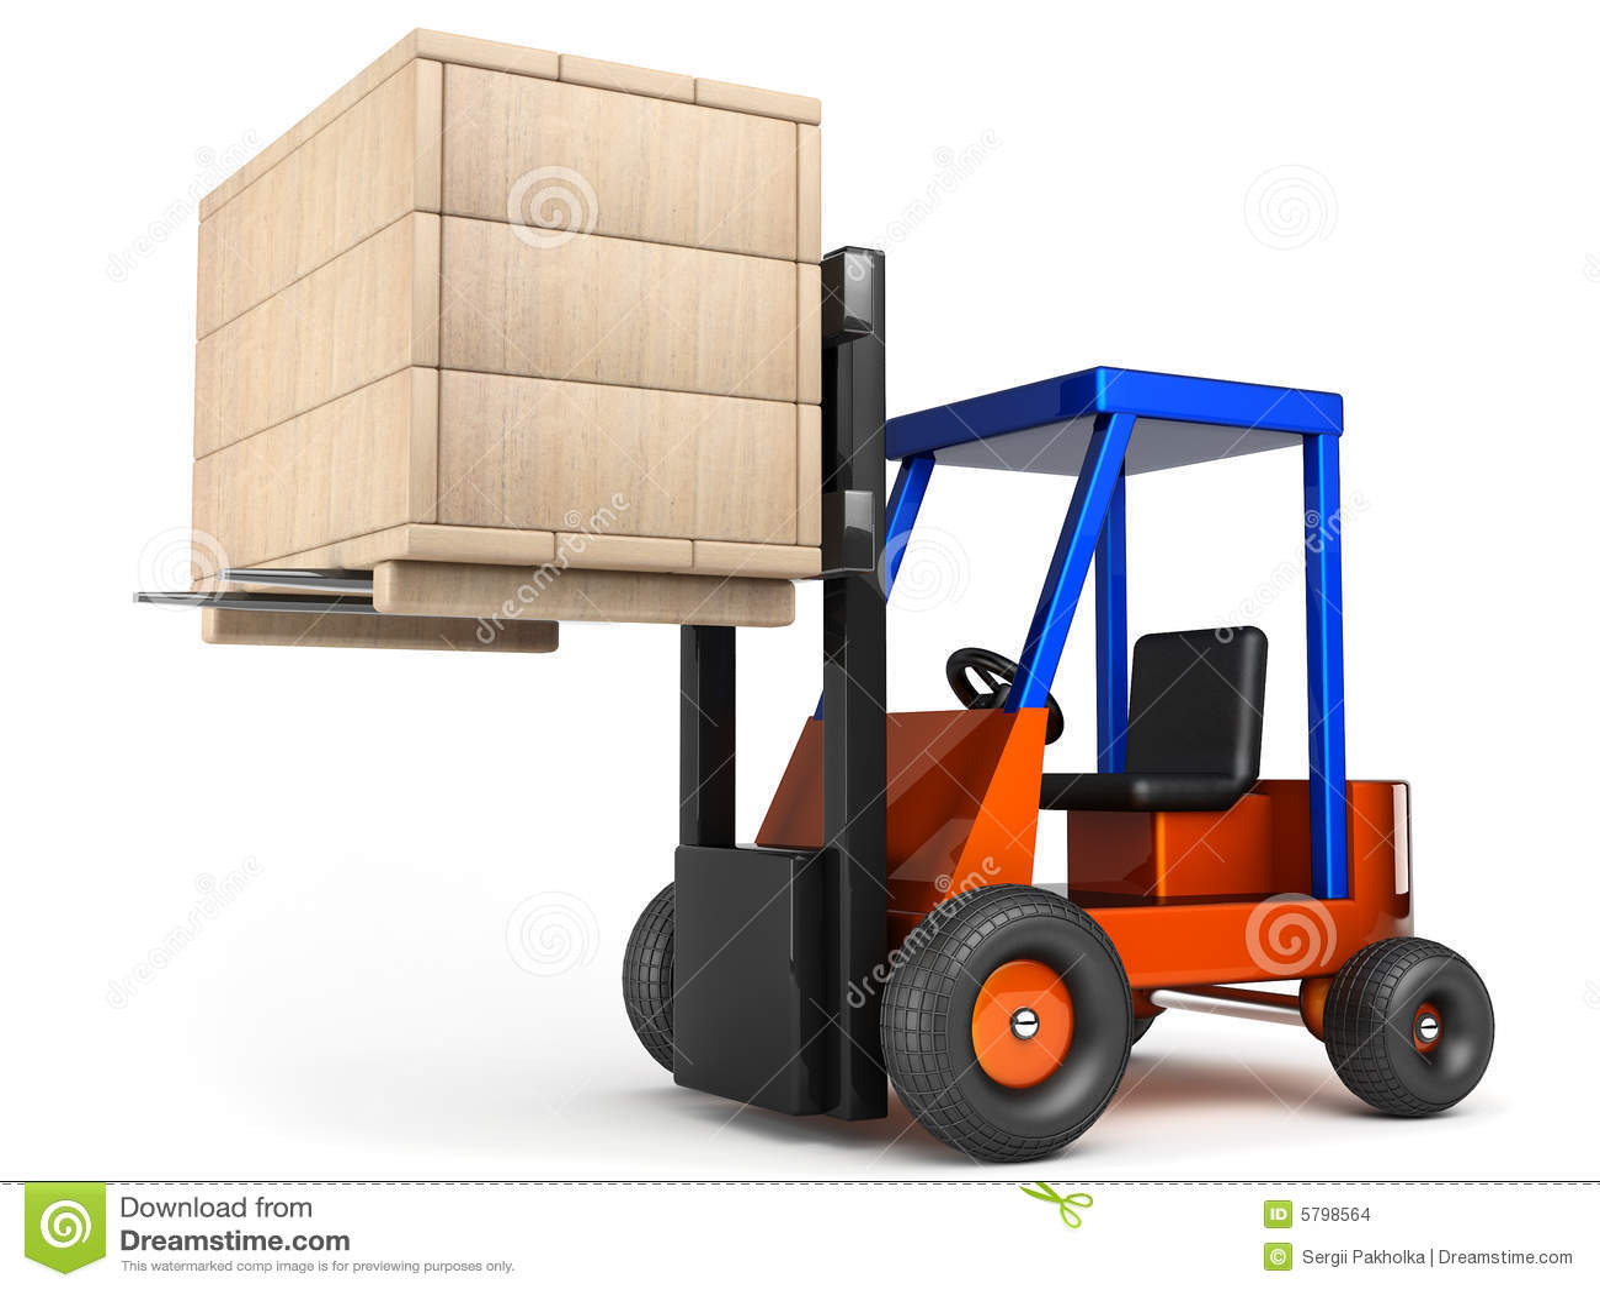 Compartment Of A Fork Lift : Forklift hoist wooden box stock illustration